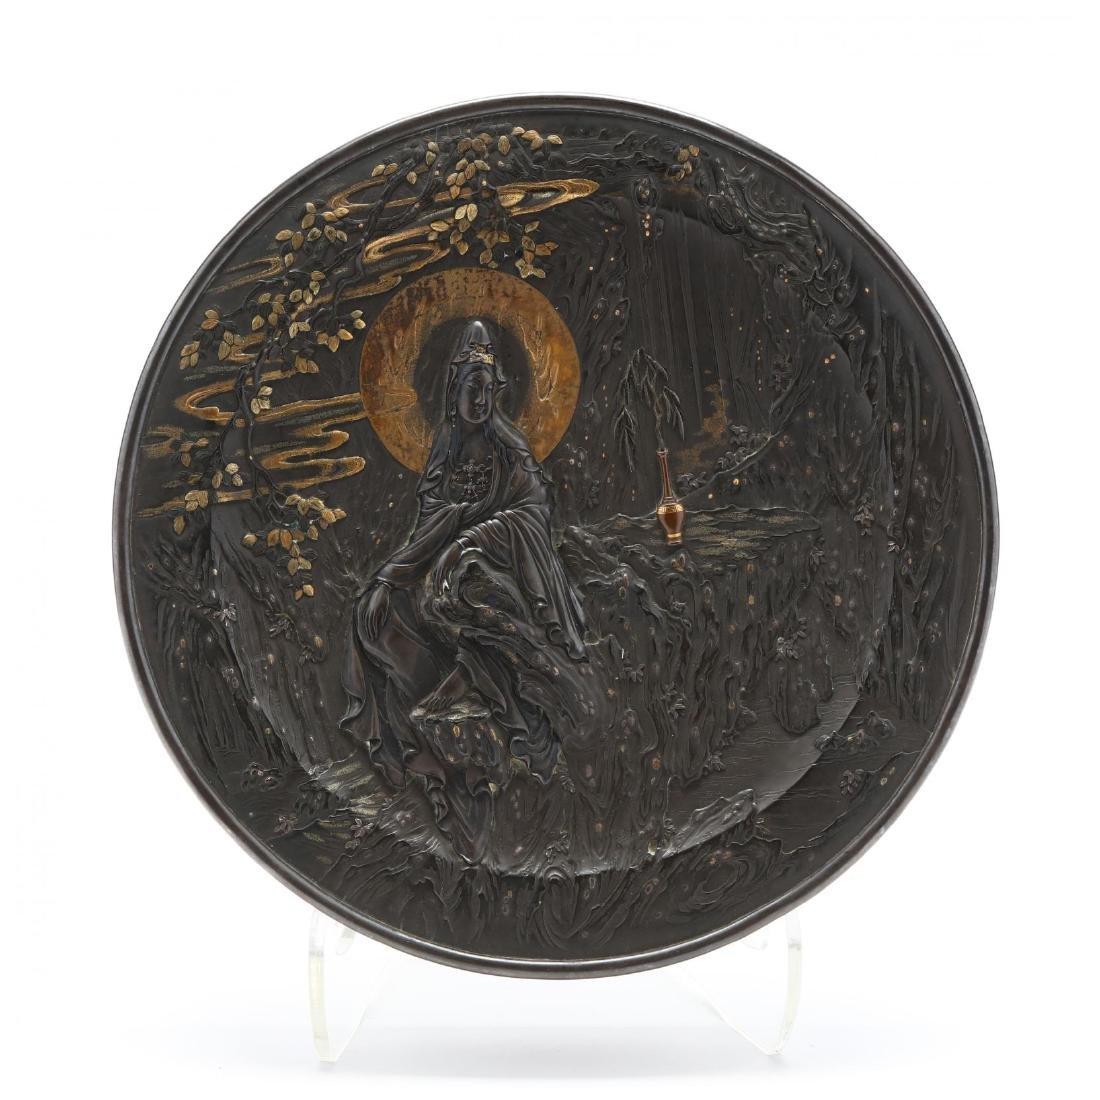 A Bronze and Mixed Metals Circular Box with Bodhisattva